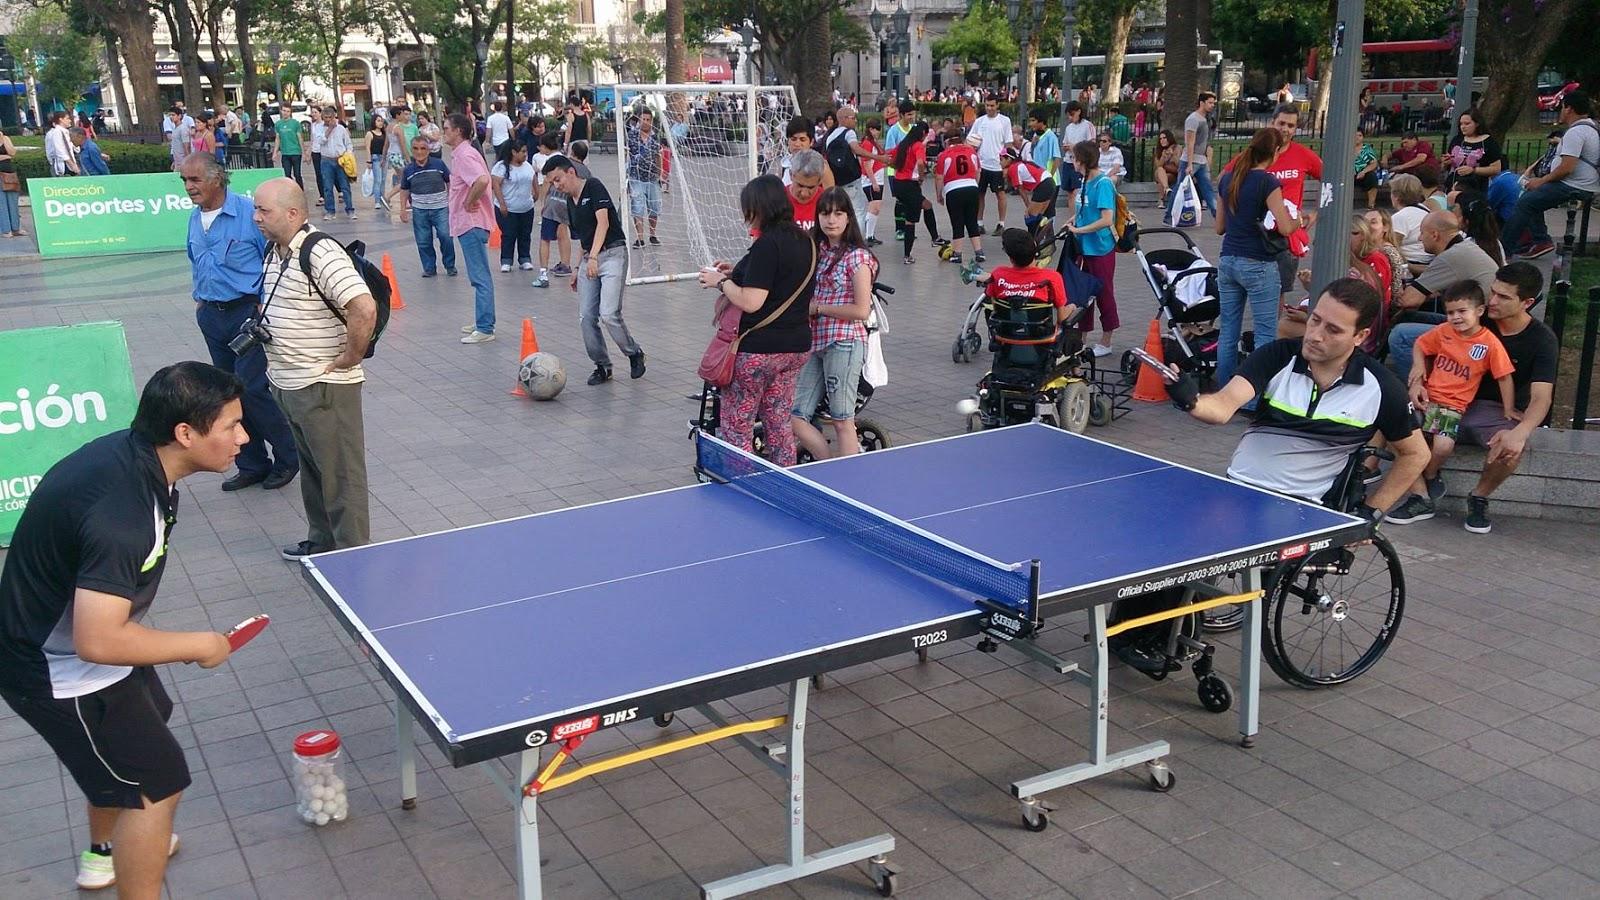 Tenis-de-mesa-adaptado-o-paraolímpico-3